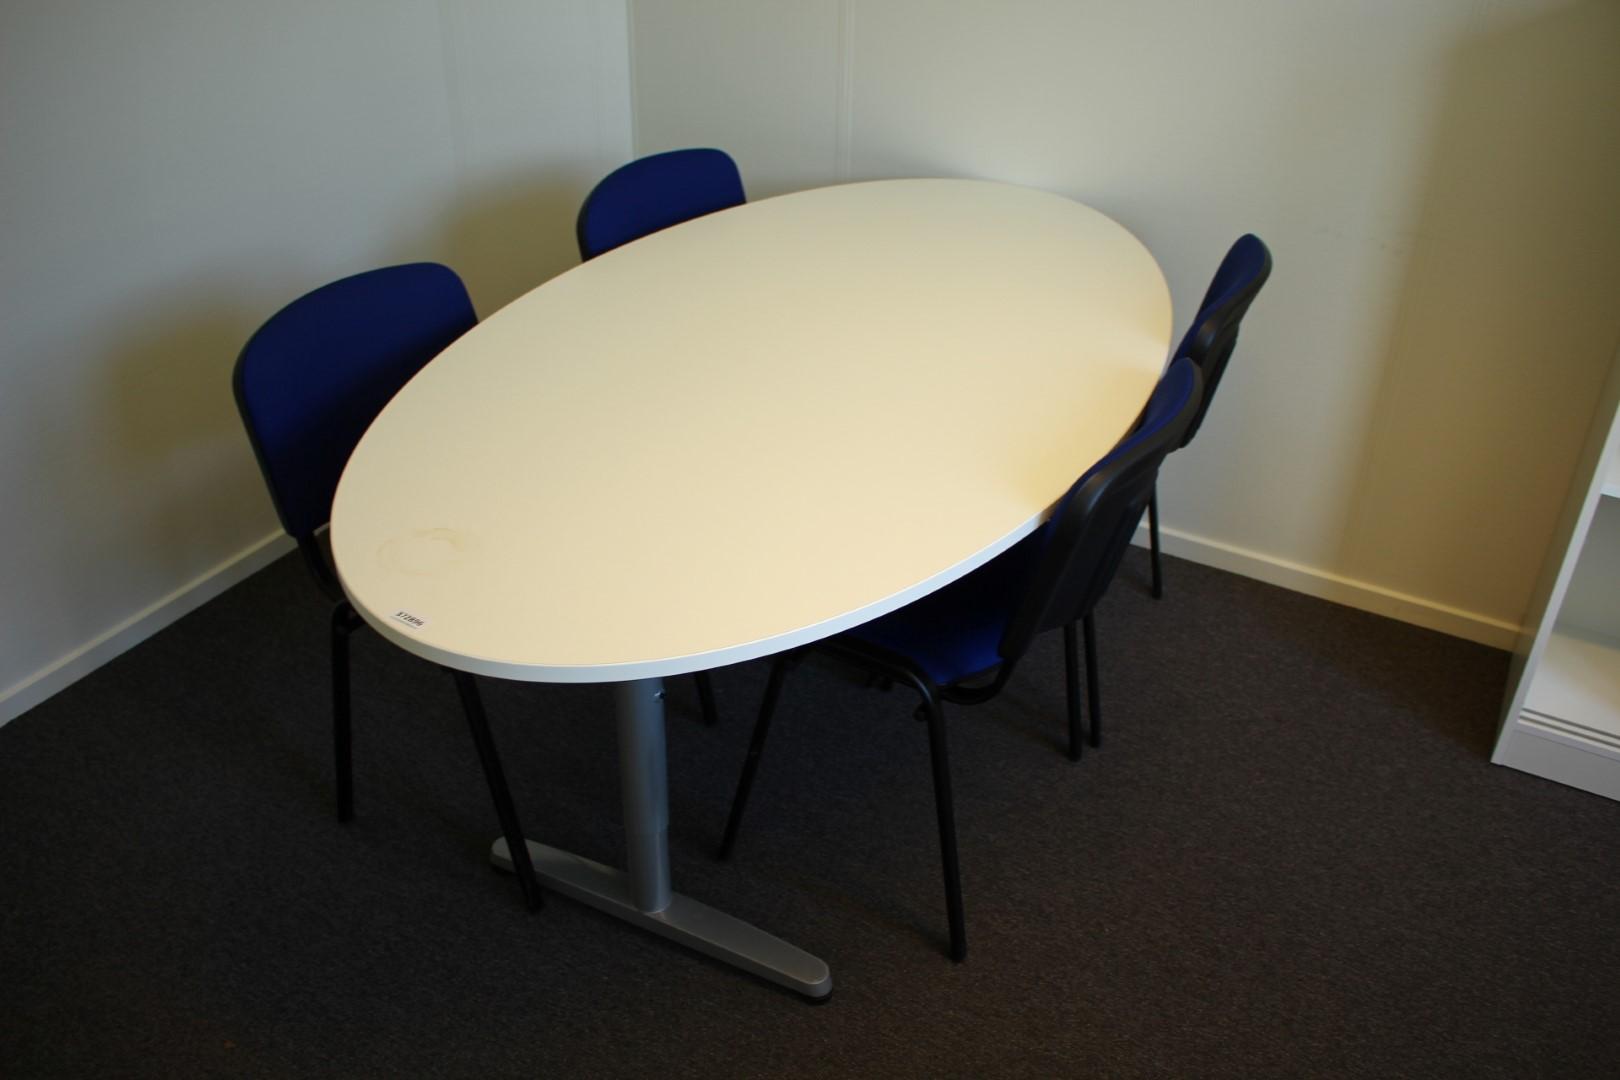 Konferensbord med fyra stolar + whiteboardtavla - PS Auction